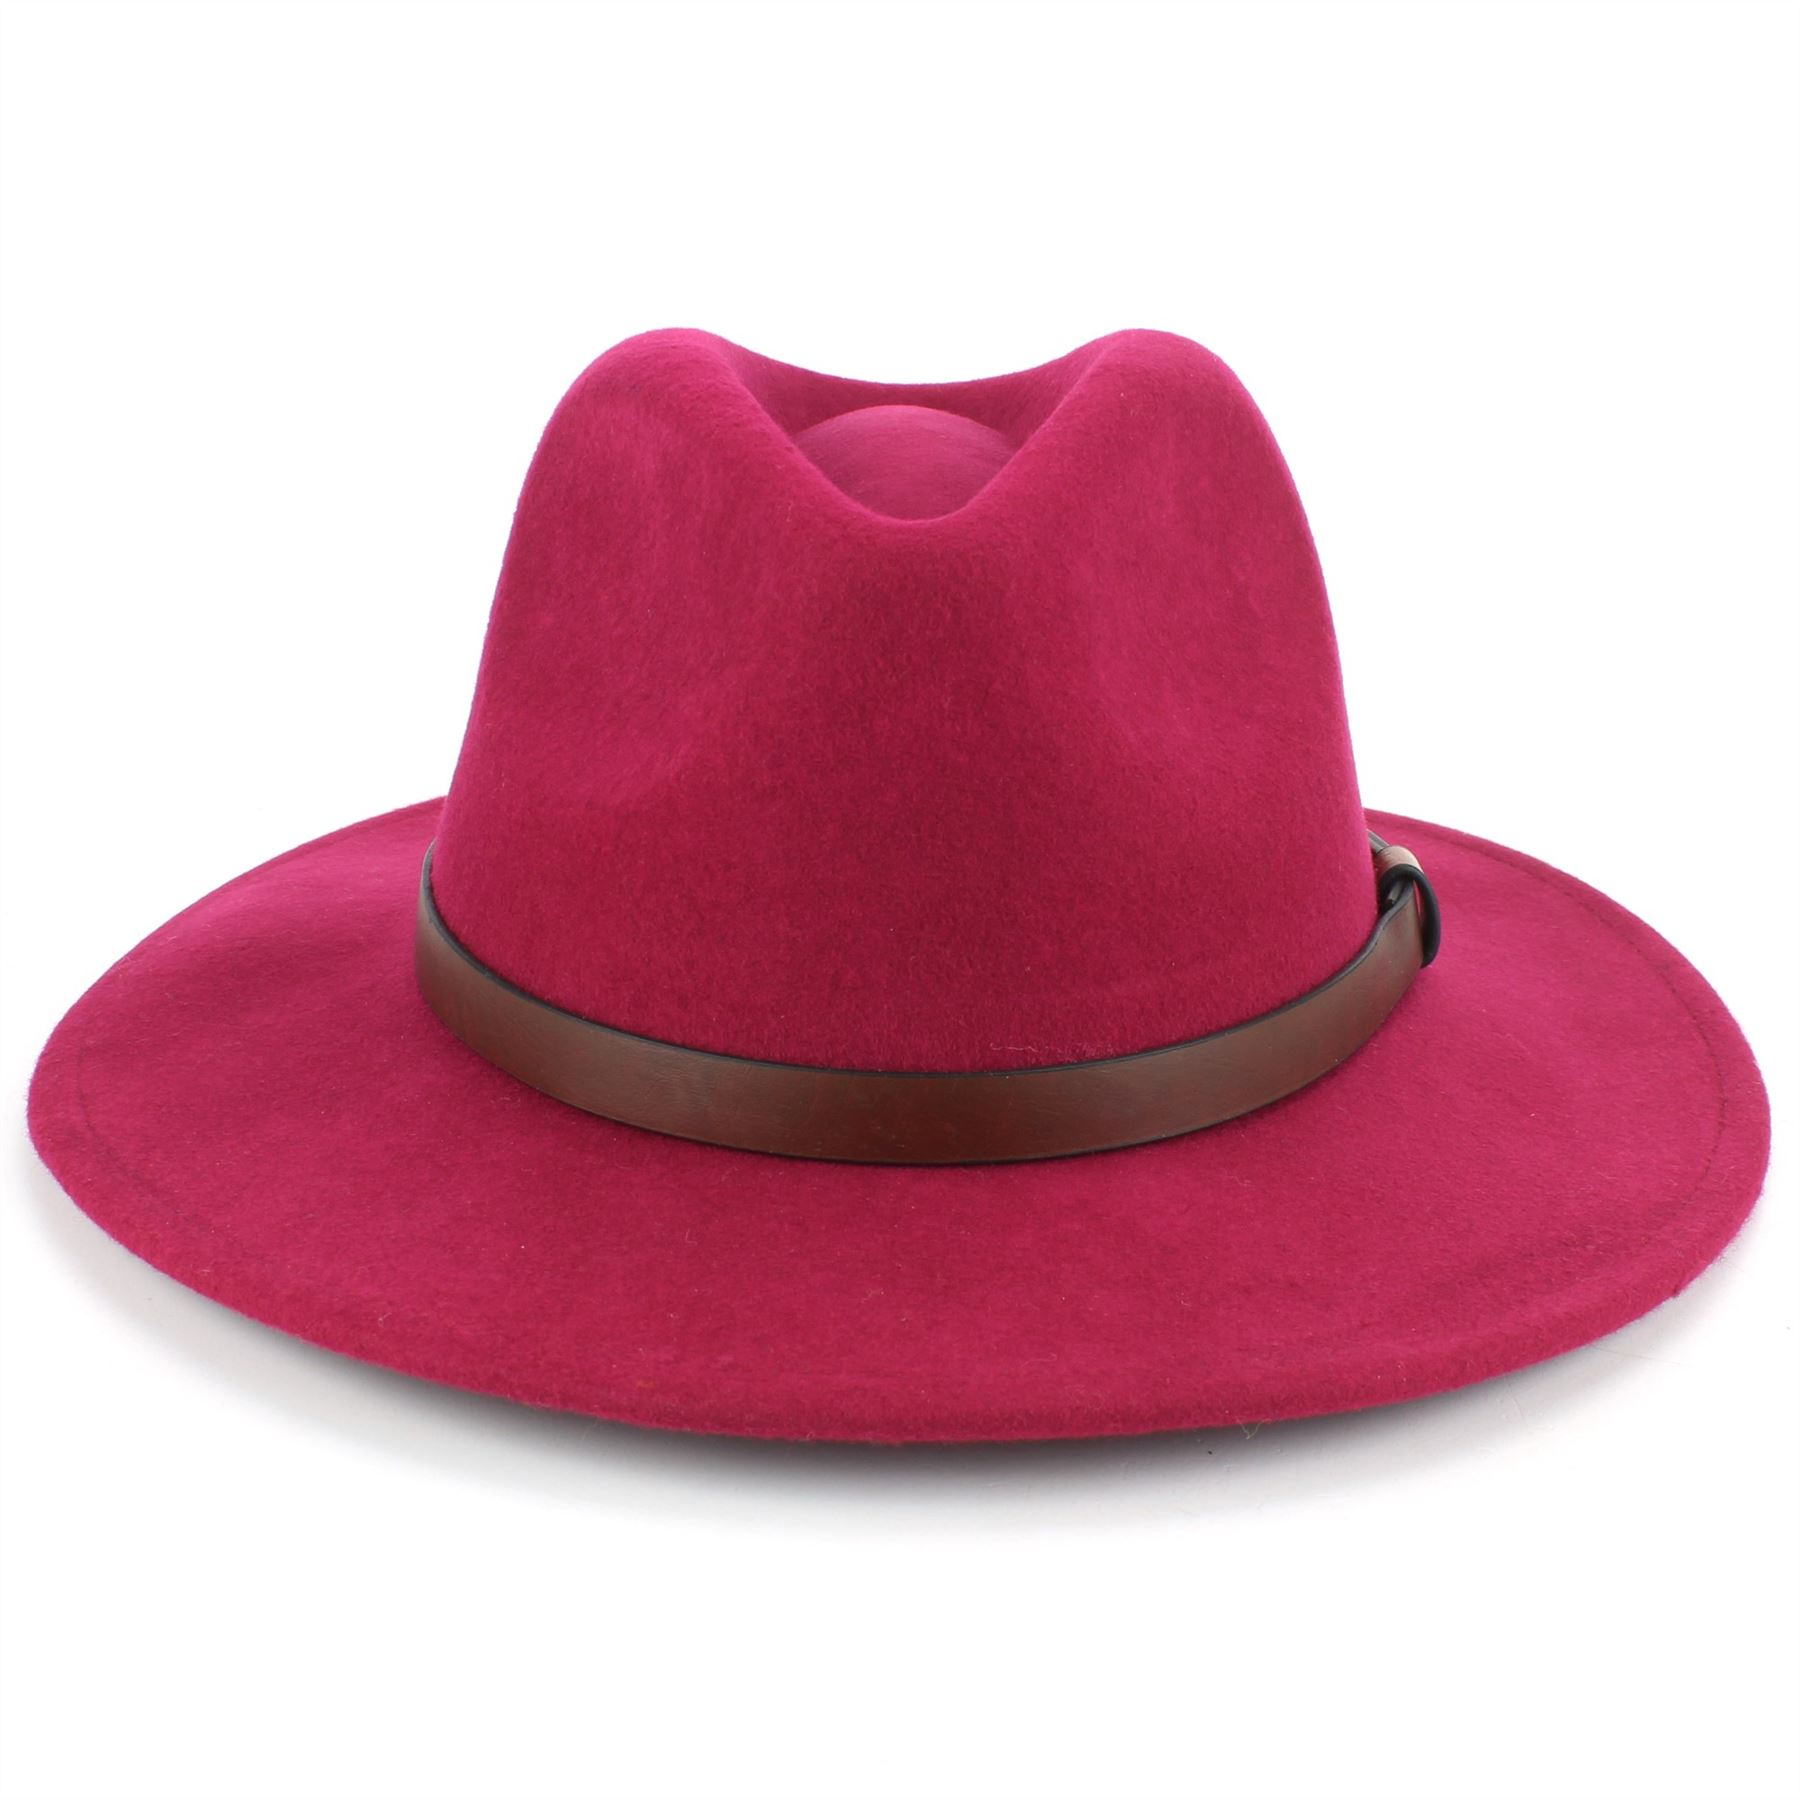 Fedora-Hat-Wool-Felt-Hawkins-Feather-Band-Trilby-Ladies-Men-Travel-Brim-Travel thumbnail 15